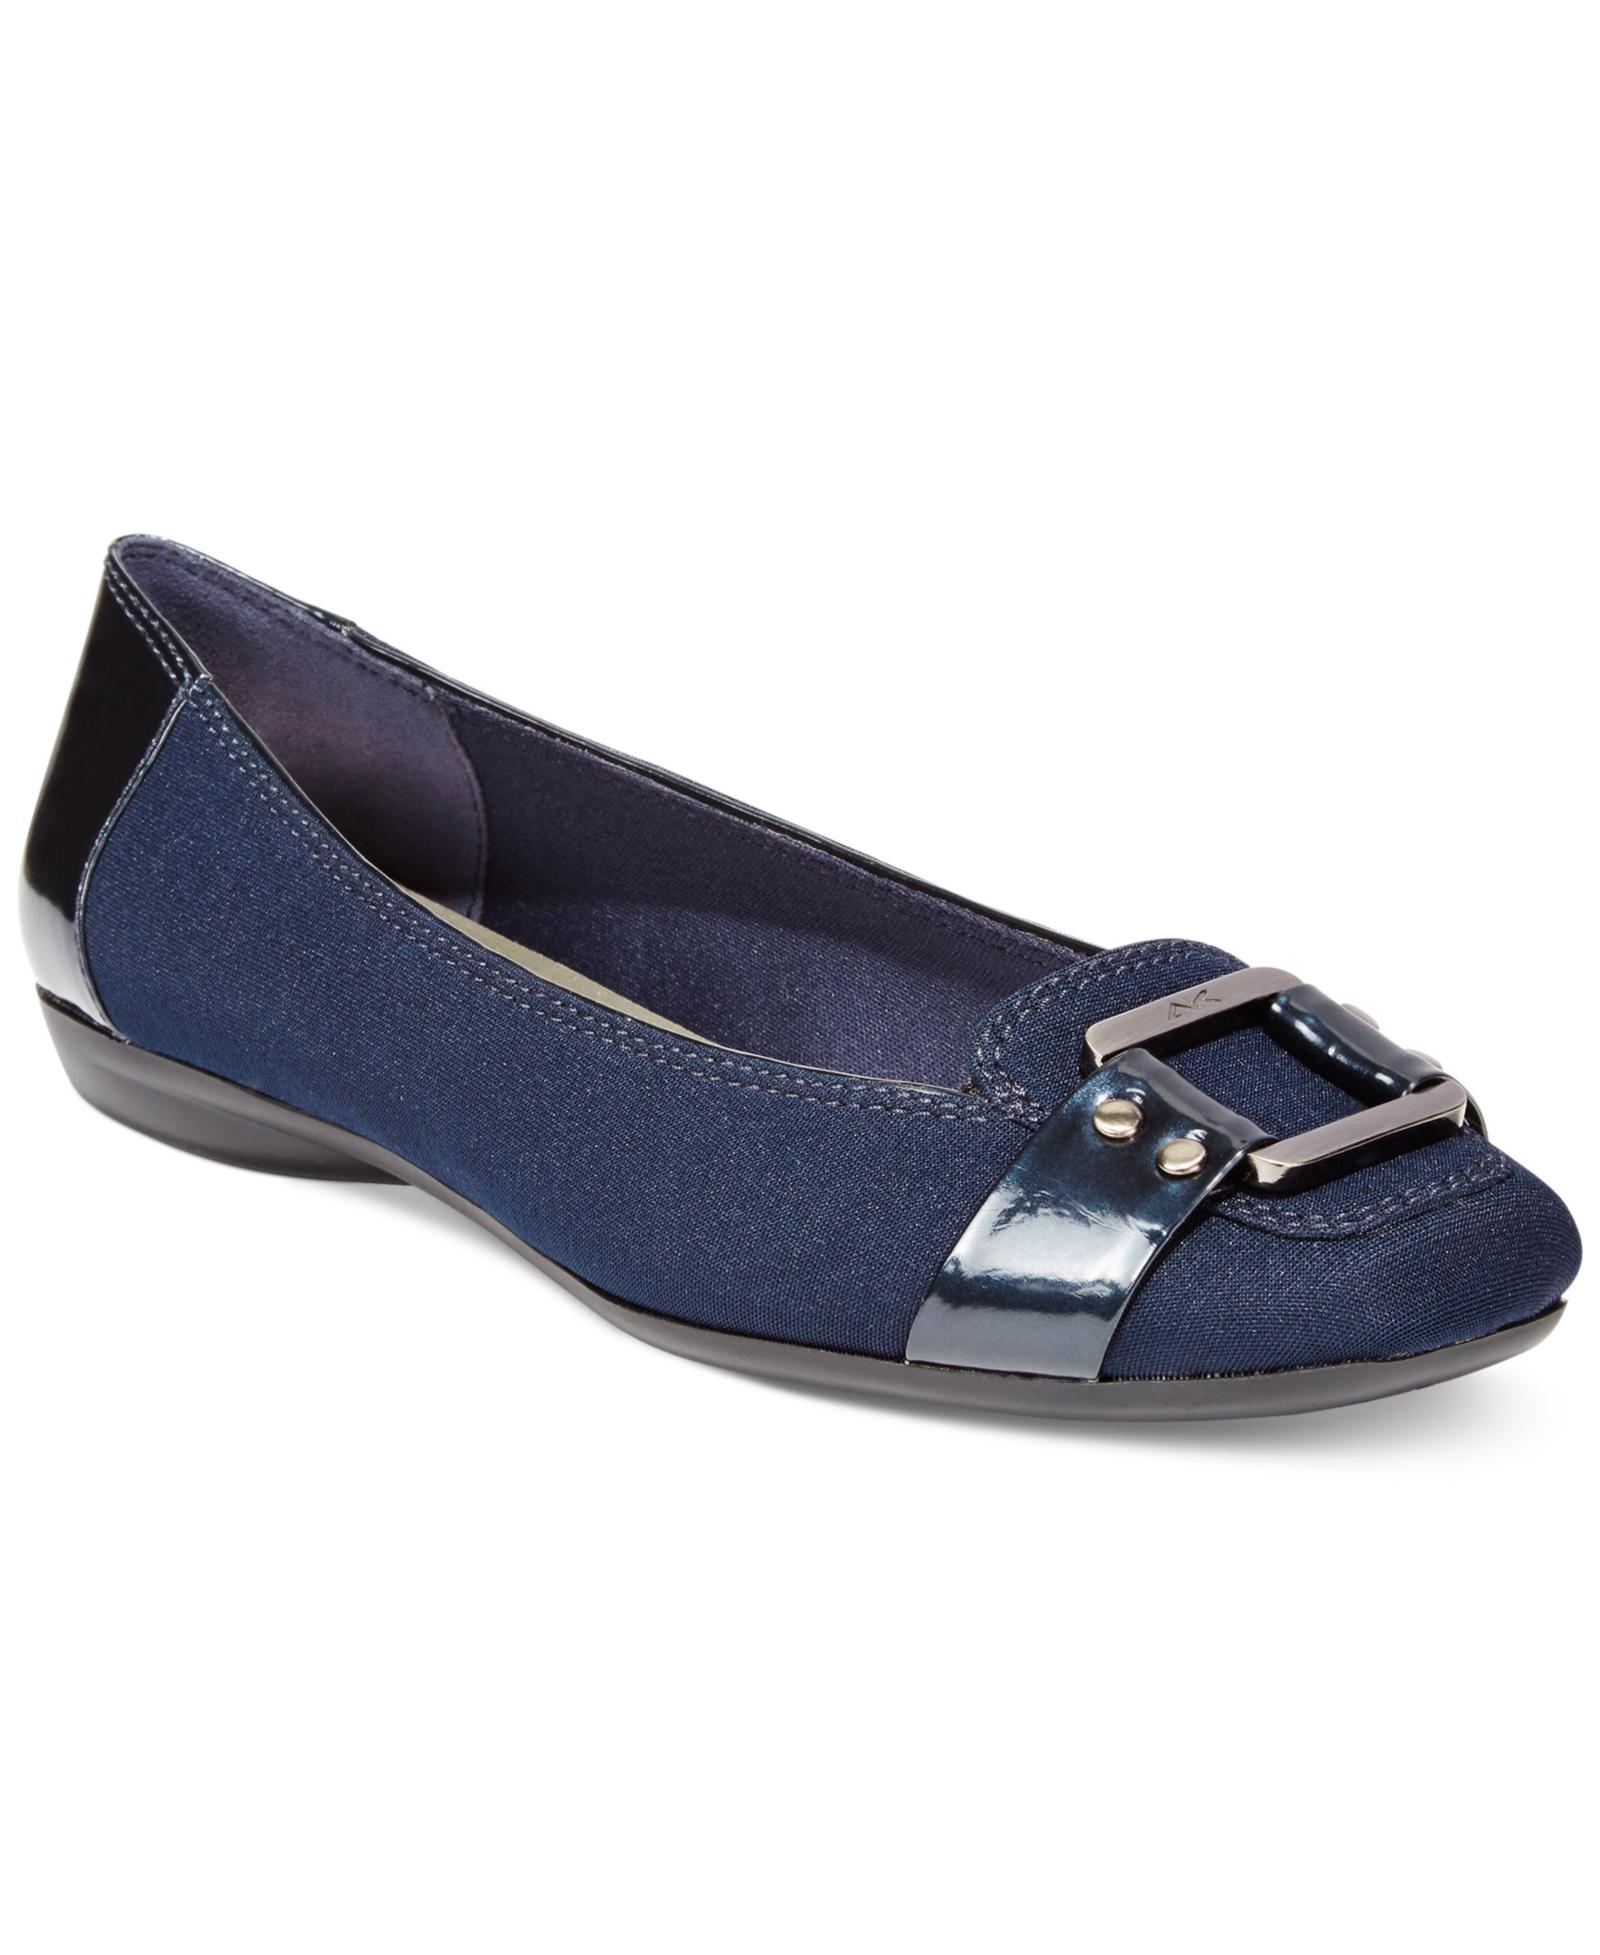 b0e72f3d44d Ak Anne Klein Sport Underpin Flats Women s Shoes